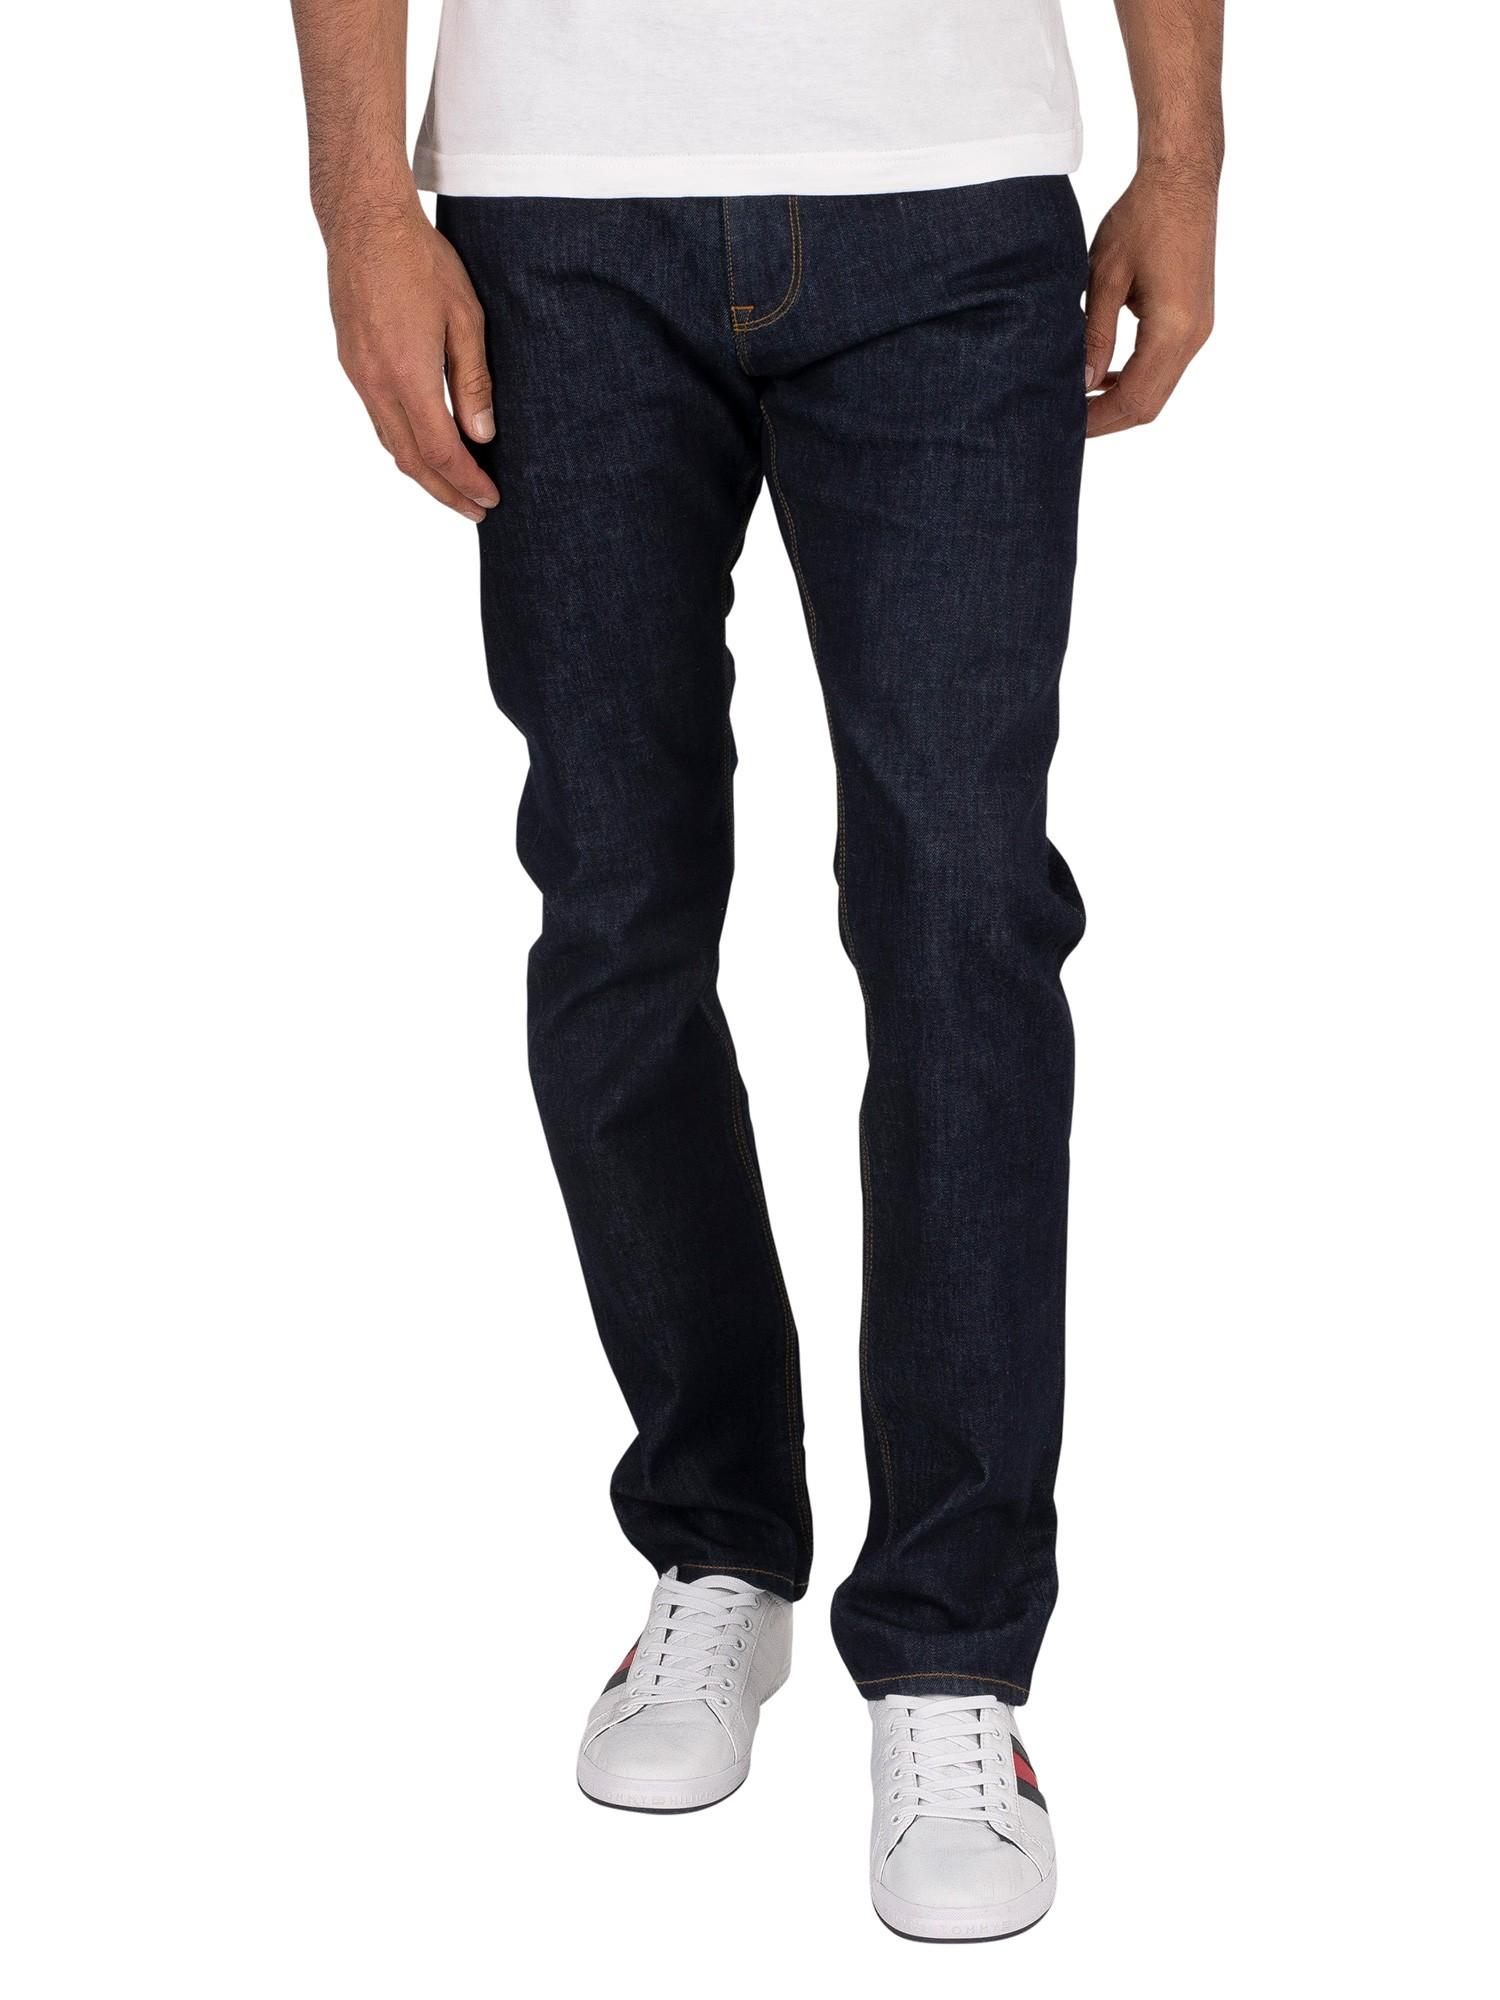 Tommy Hilfiger Core Bleecker Slim Fit Jeans 32W x 32L Washed Black